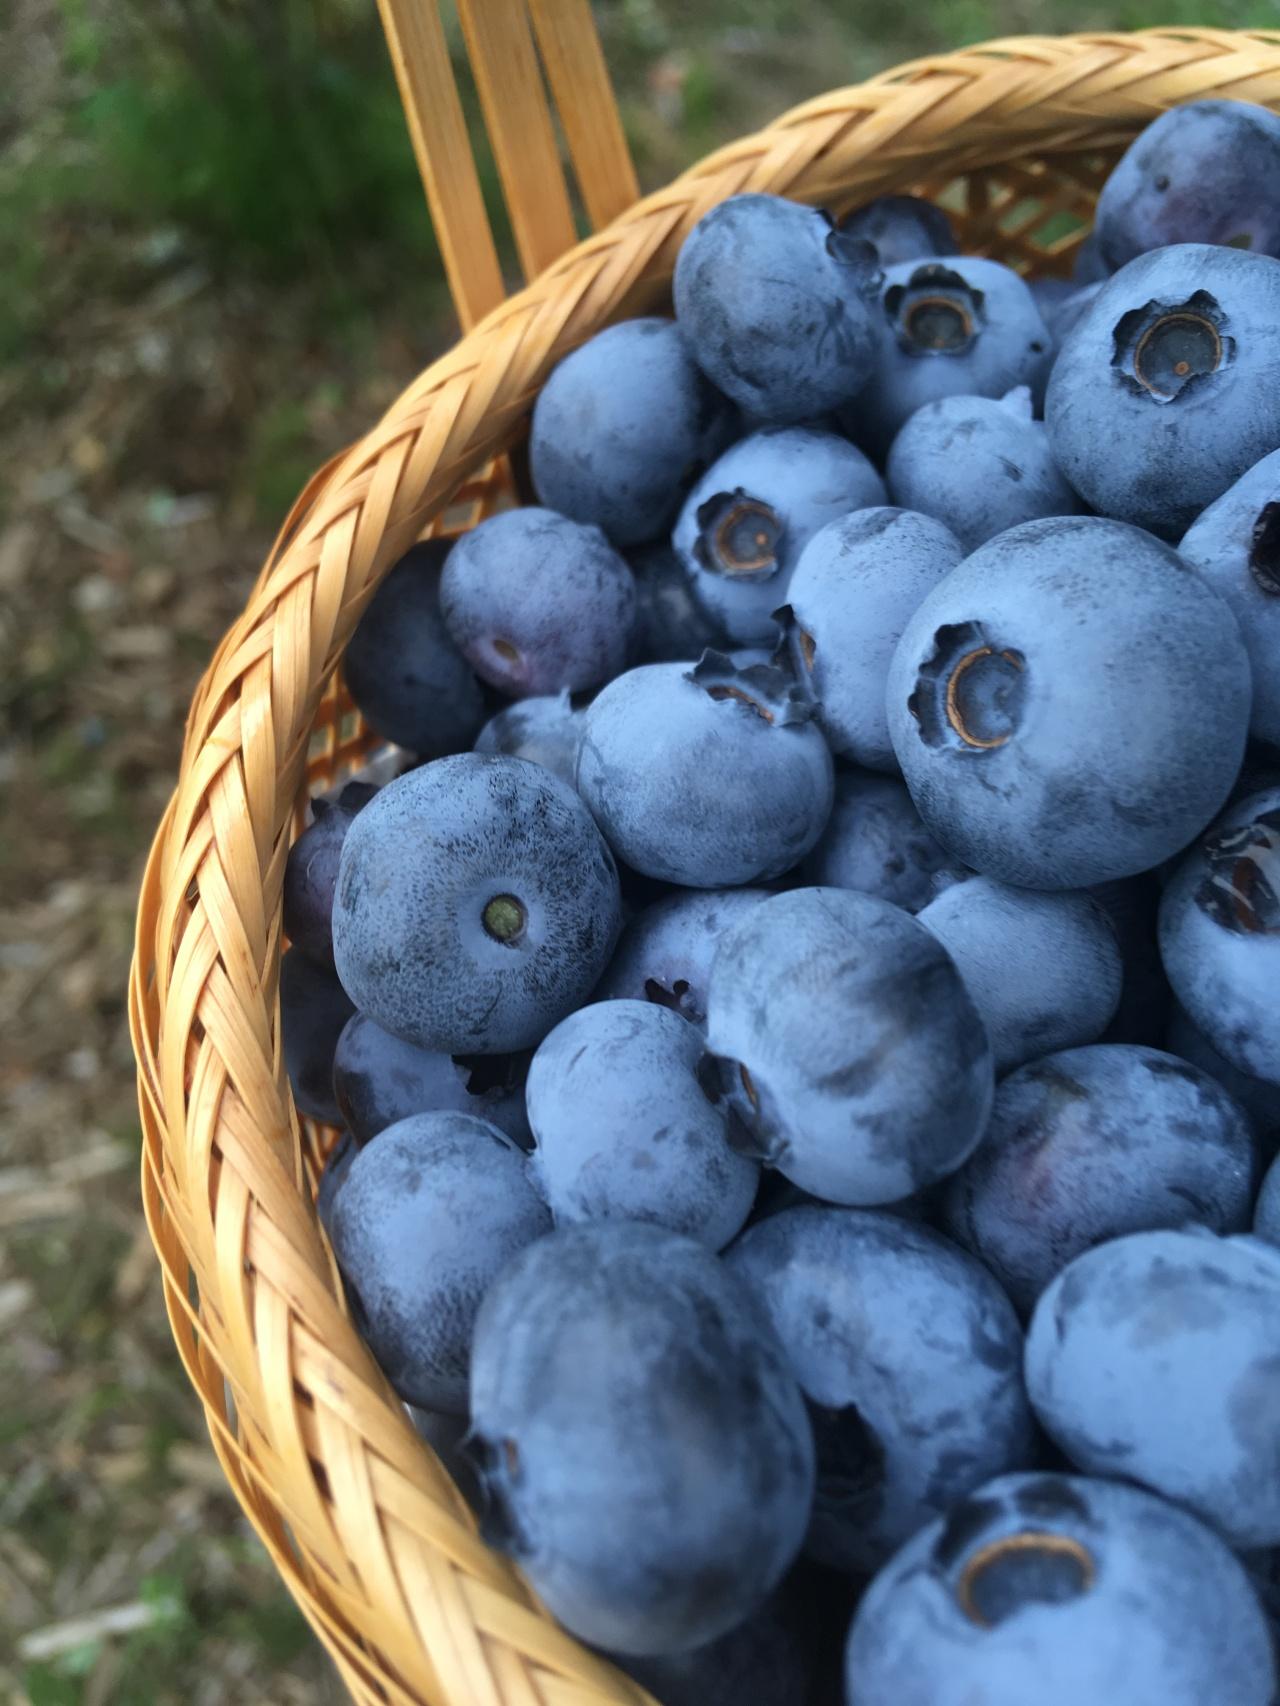 Blueberry Picking —ブルーベリー狩り